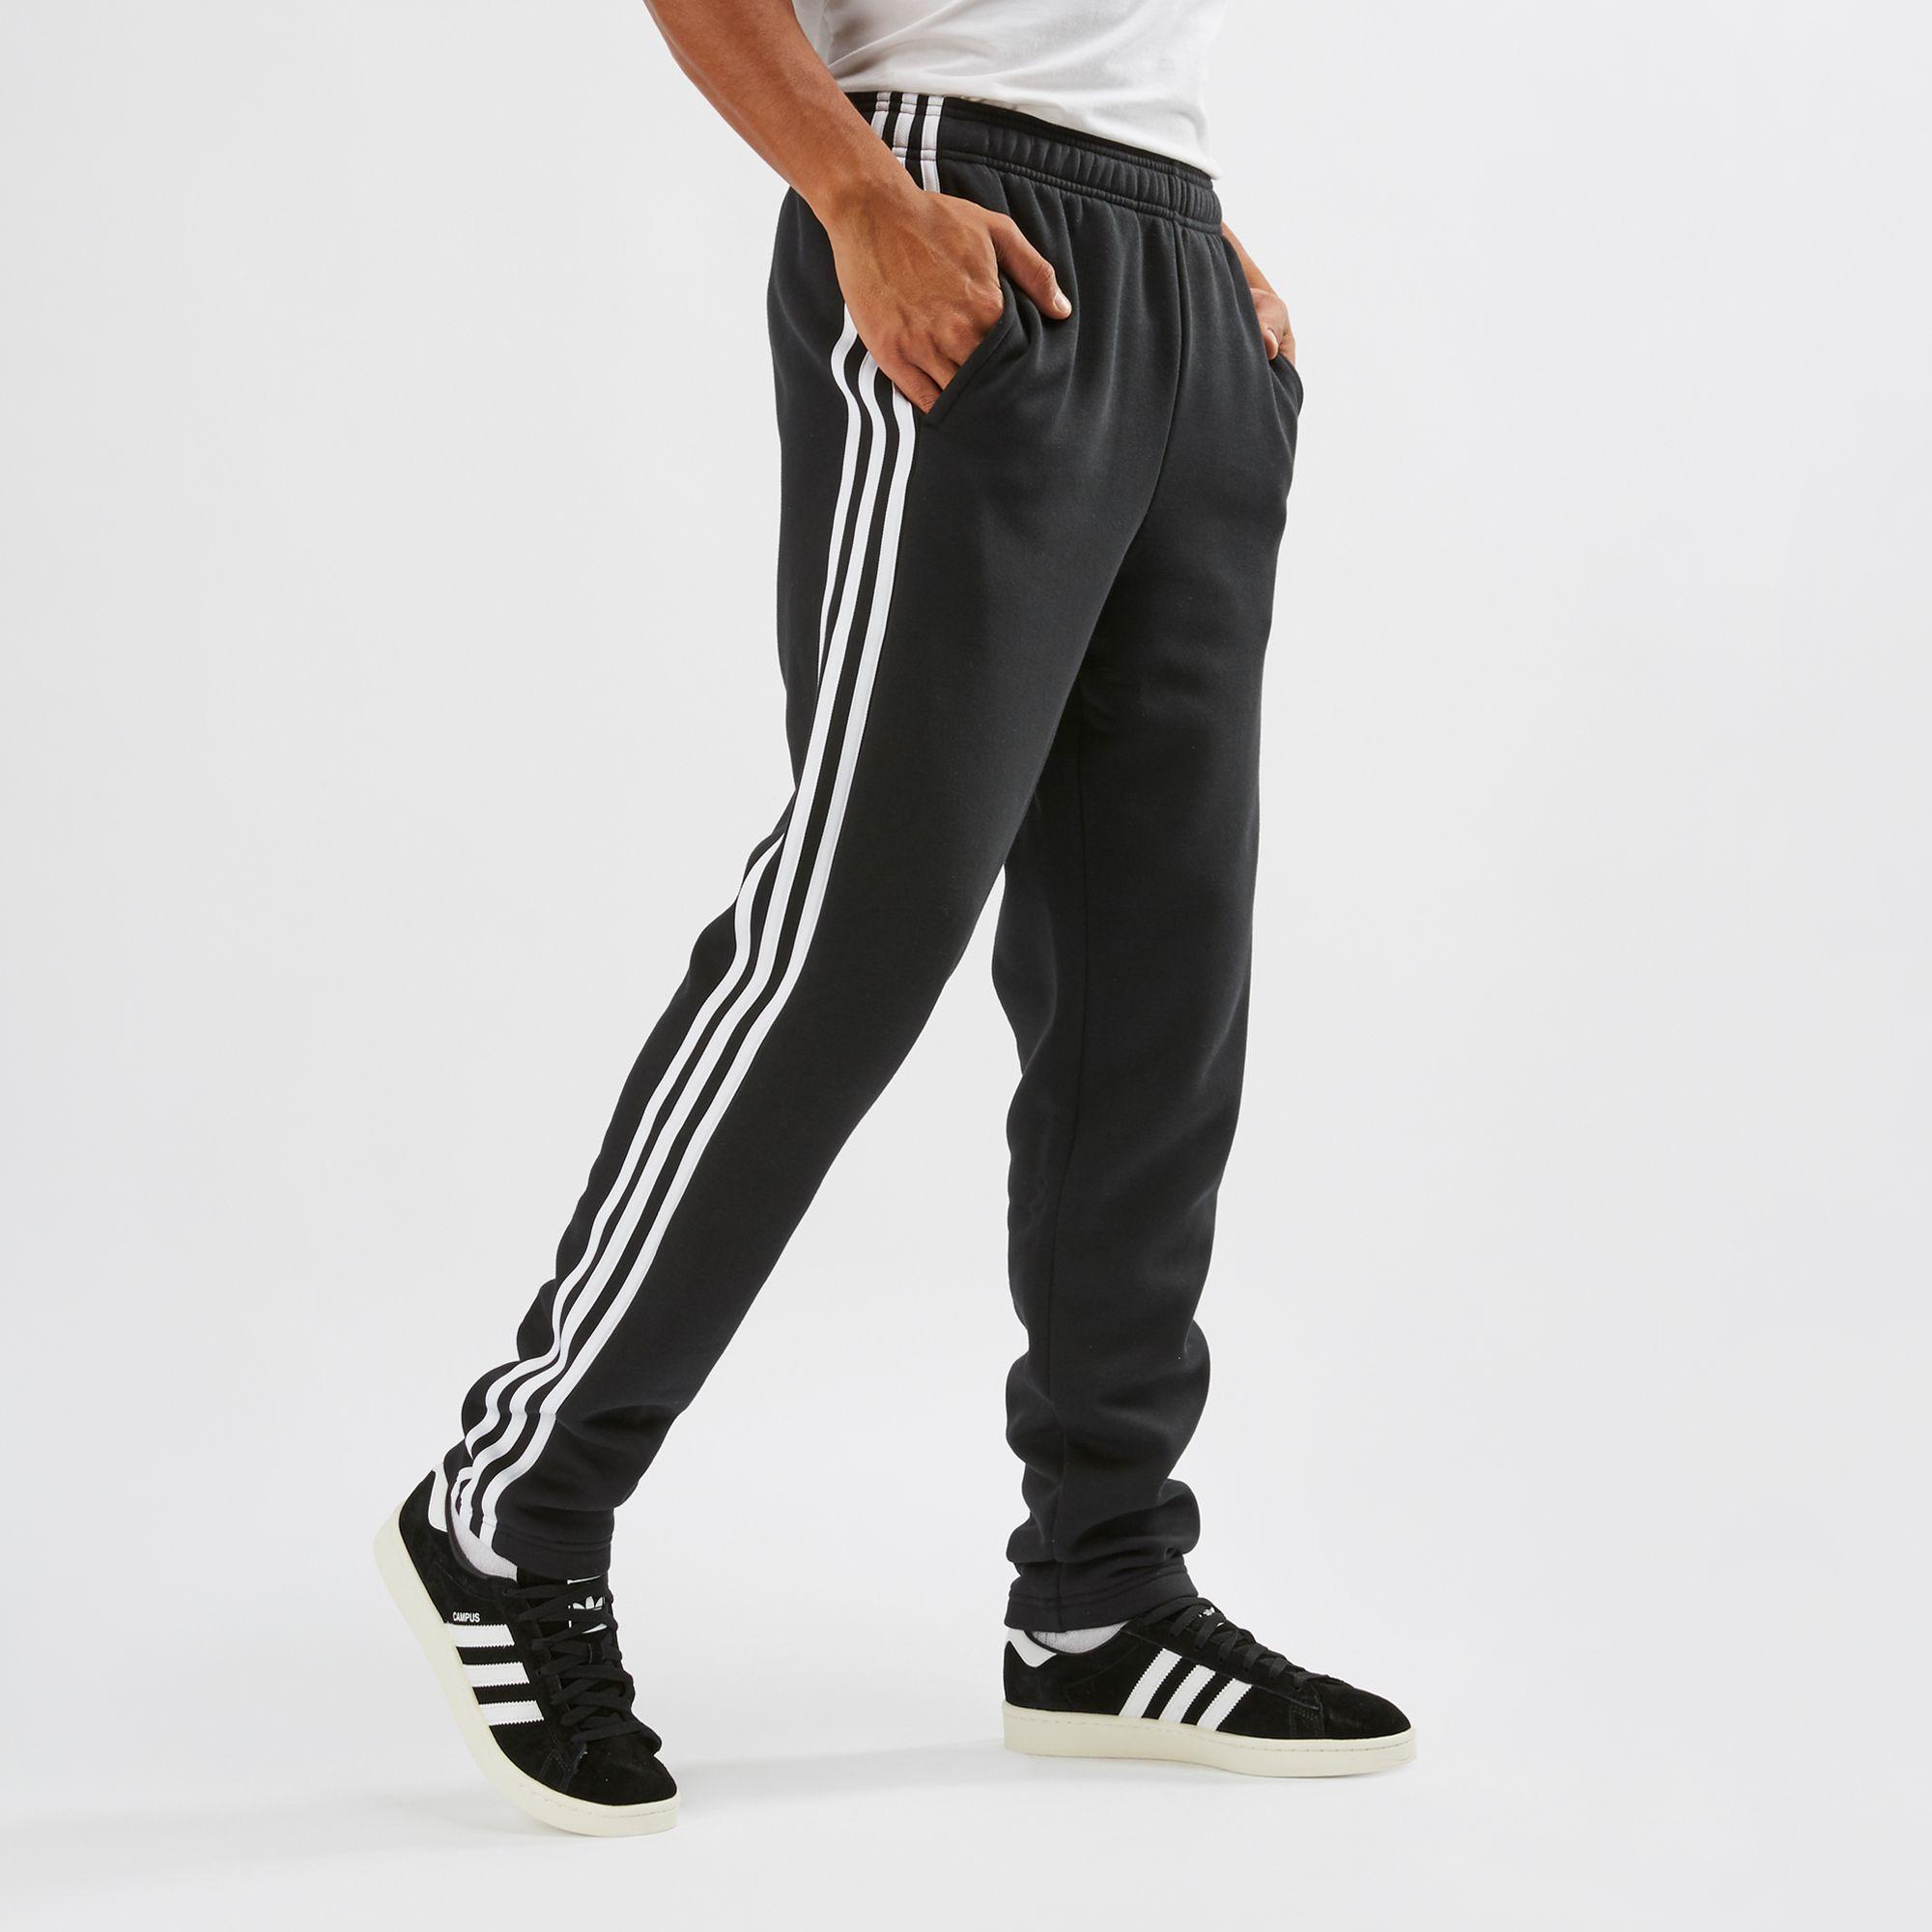 adidas 3 stripe fleece pants men's